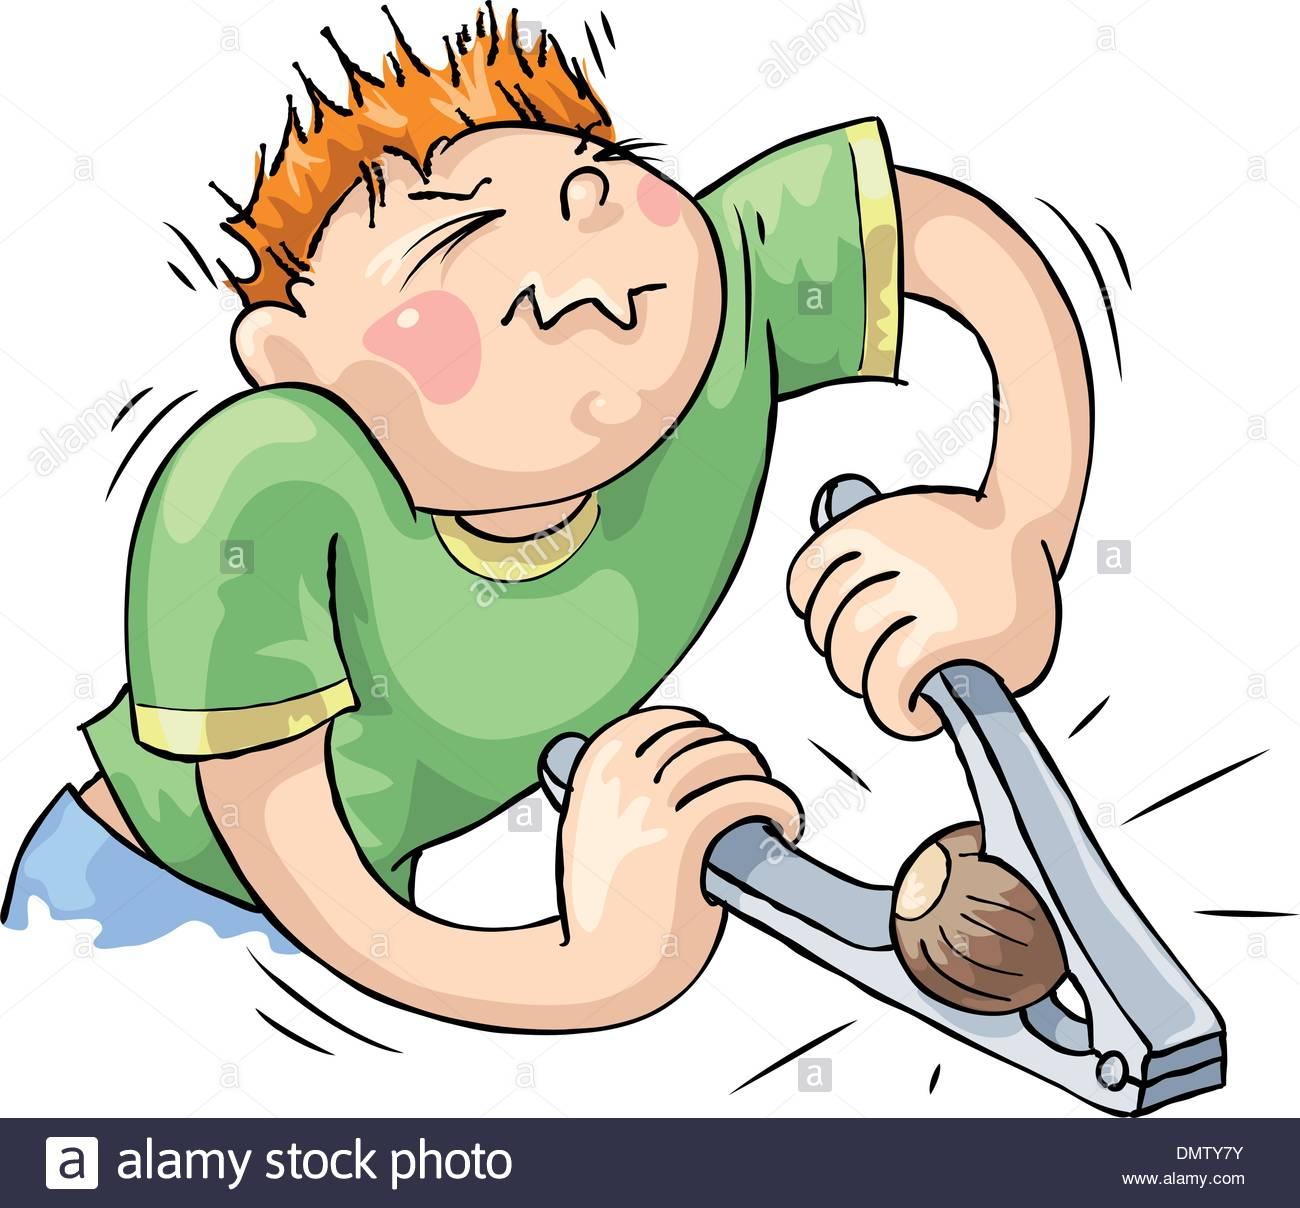 Hard Task Stock Vector Art & Illustration, Vector Image: 64472463.